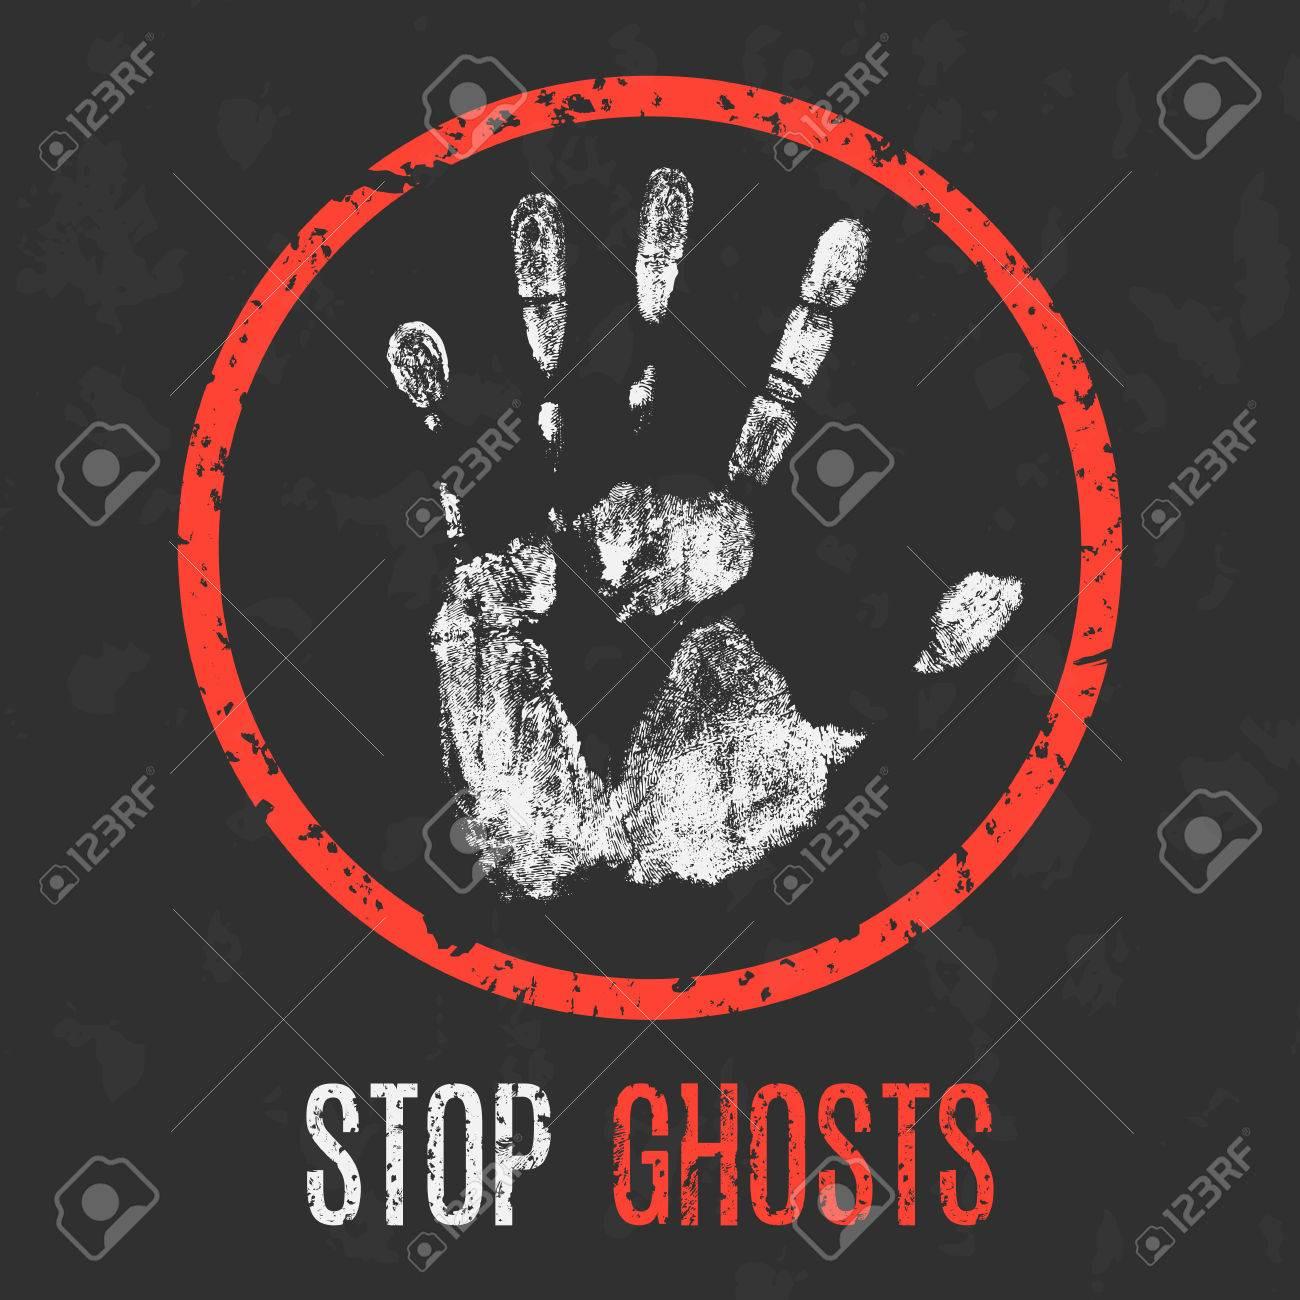 Vector illustration. Paranormal phenomena: stop ghosts. - 74804239